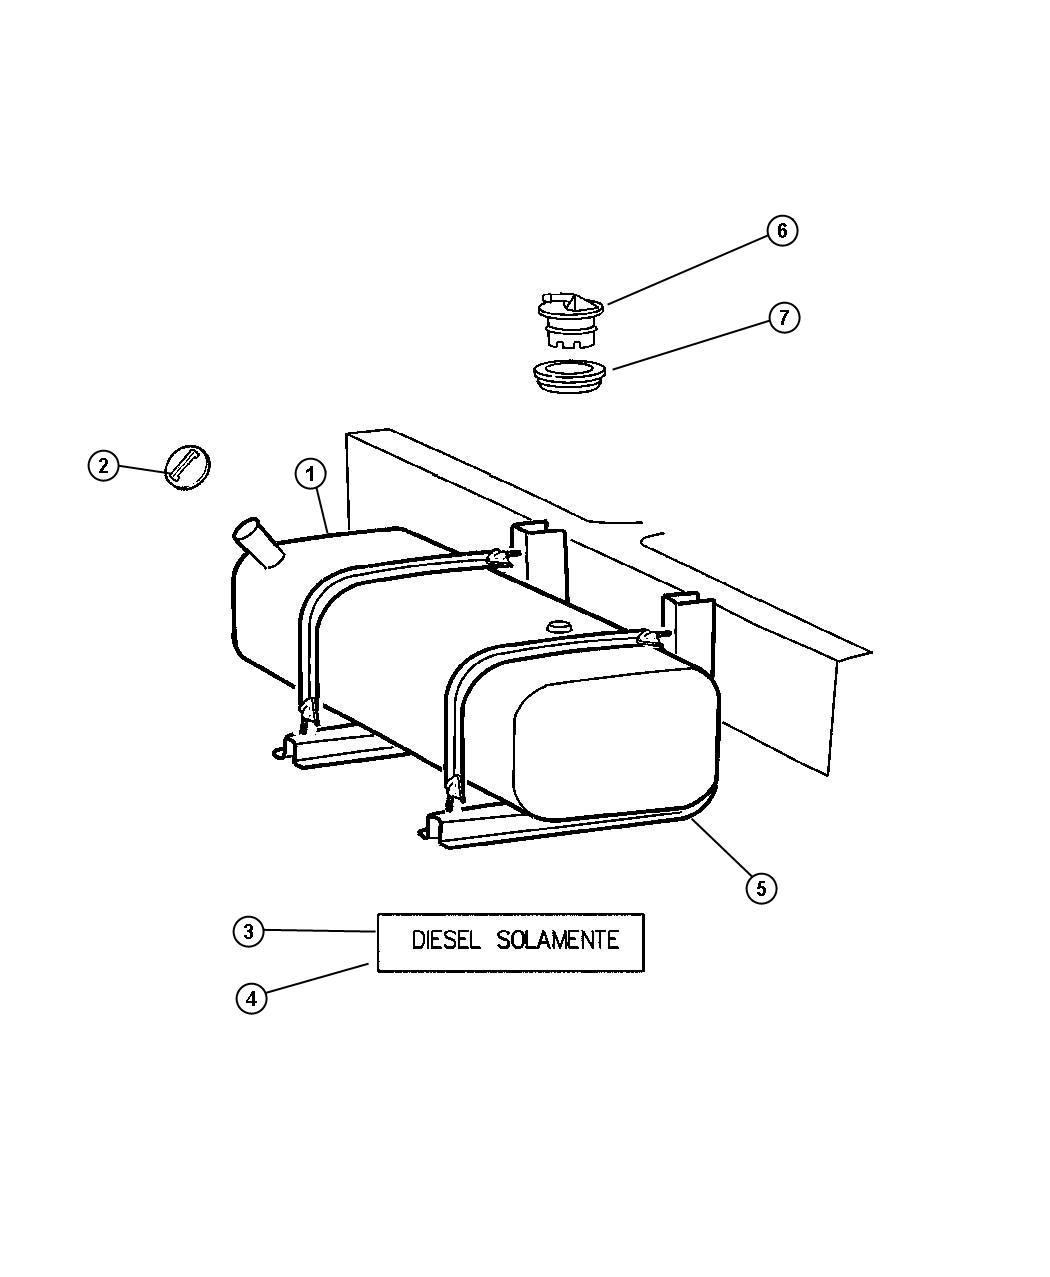 Dodge Ram Valve Fuel Tank Rollover Safety